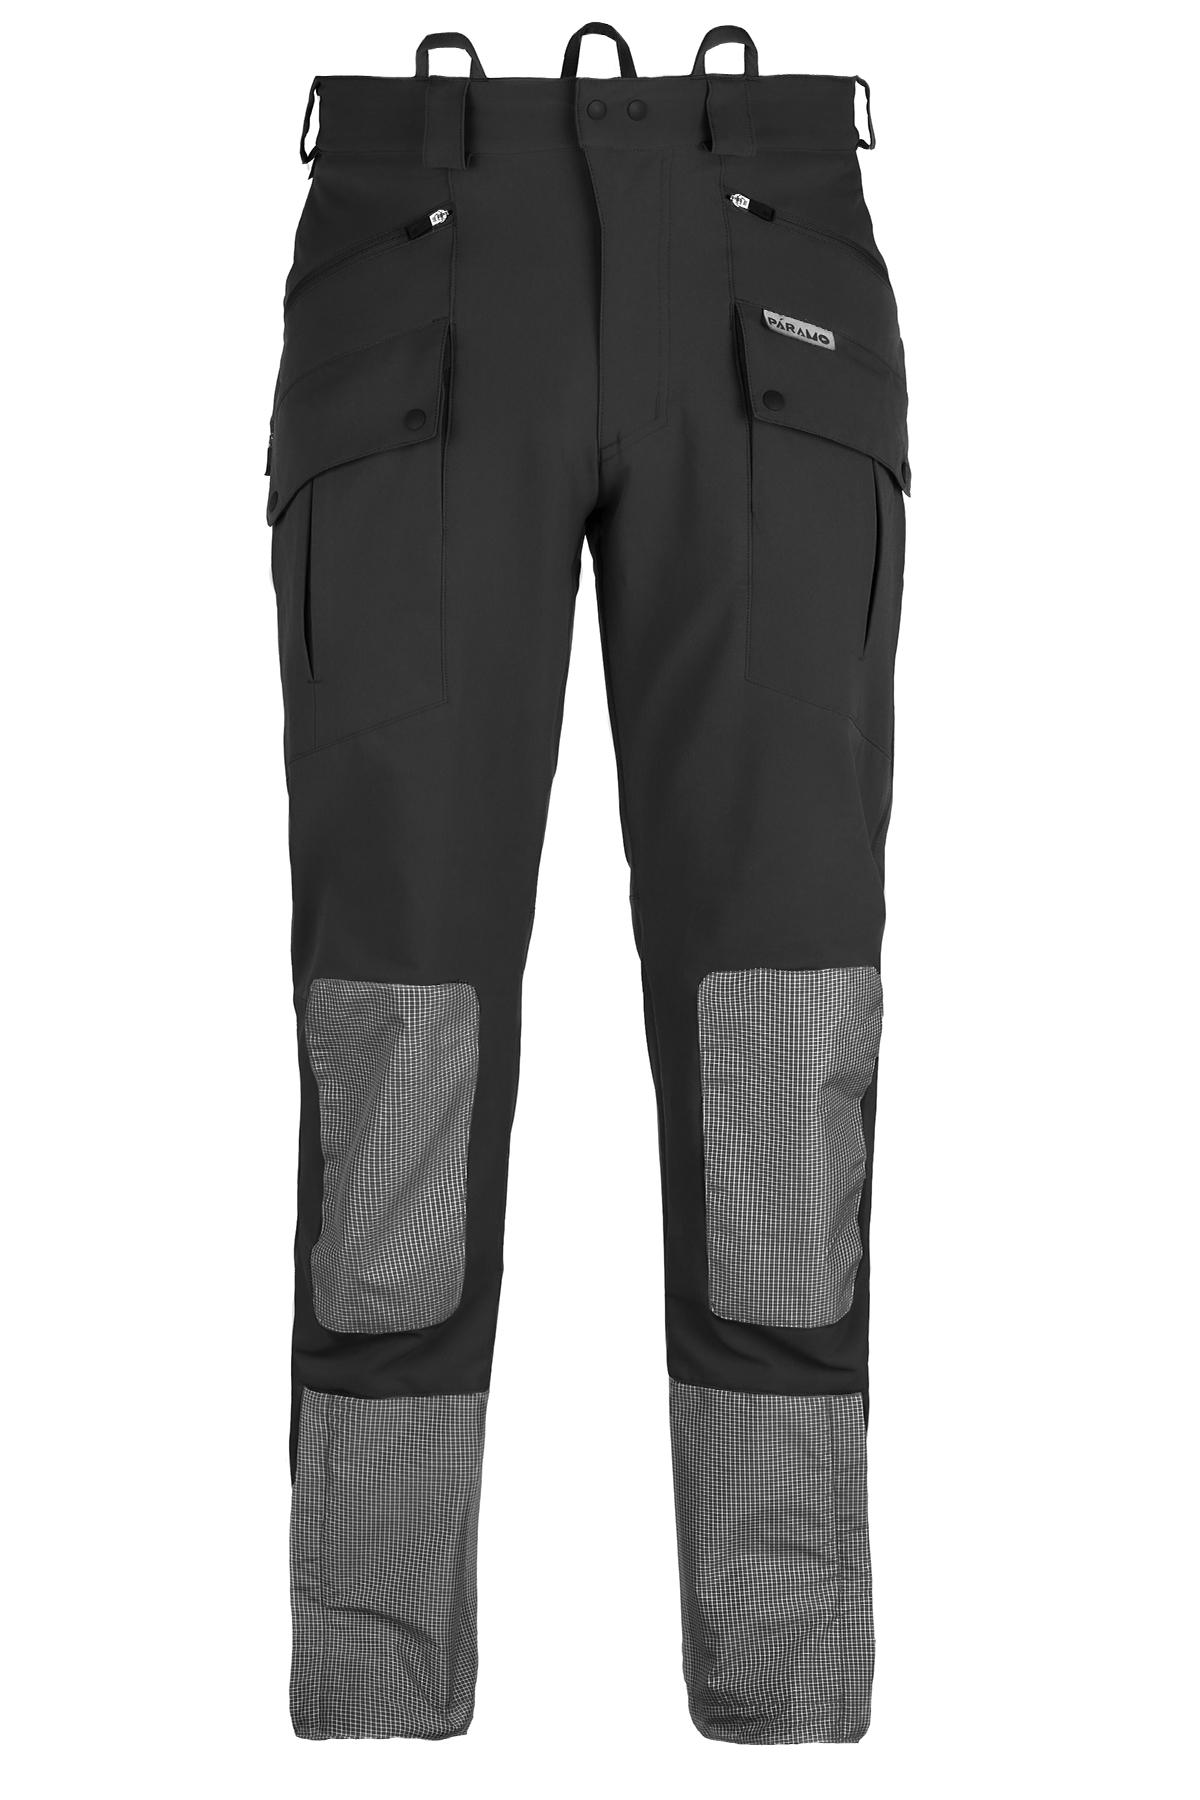 Paramo Men's Enduro Trek Trousers